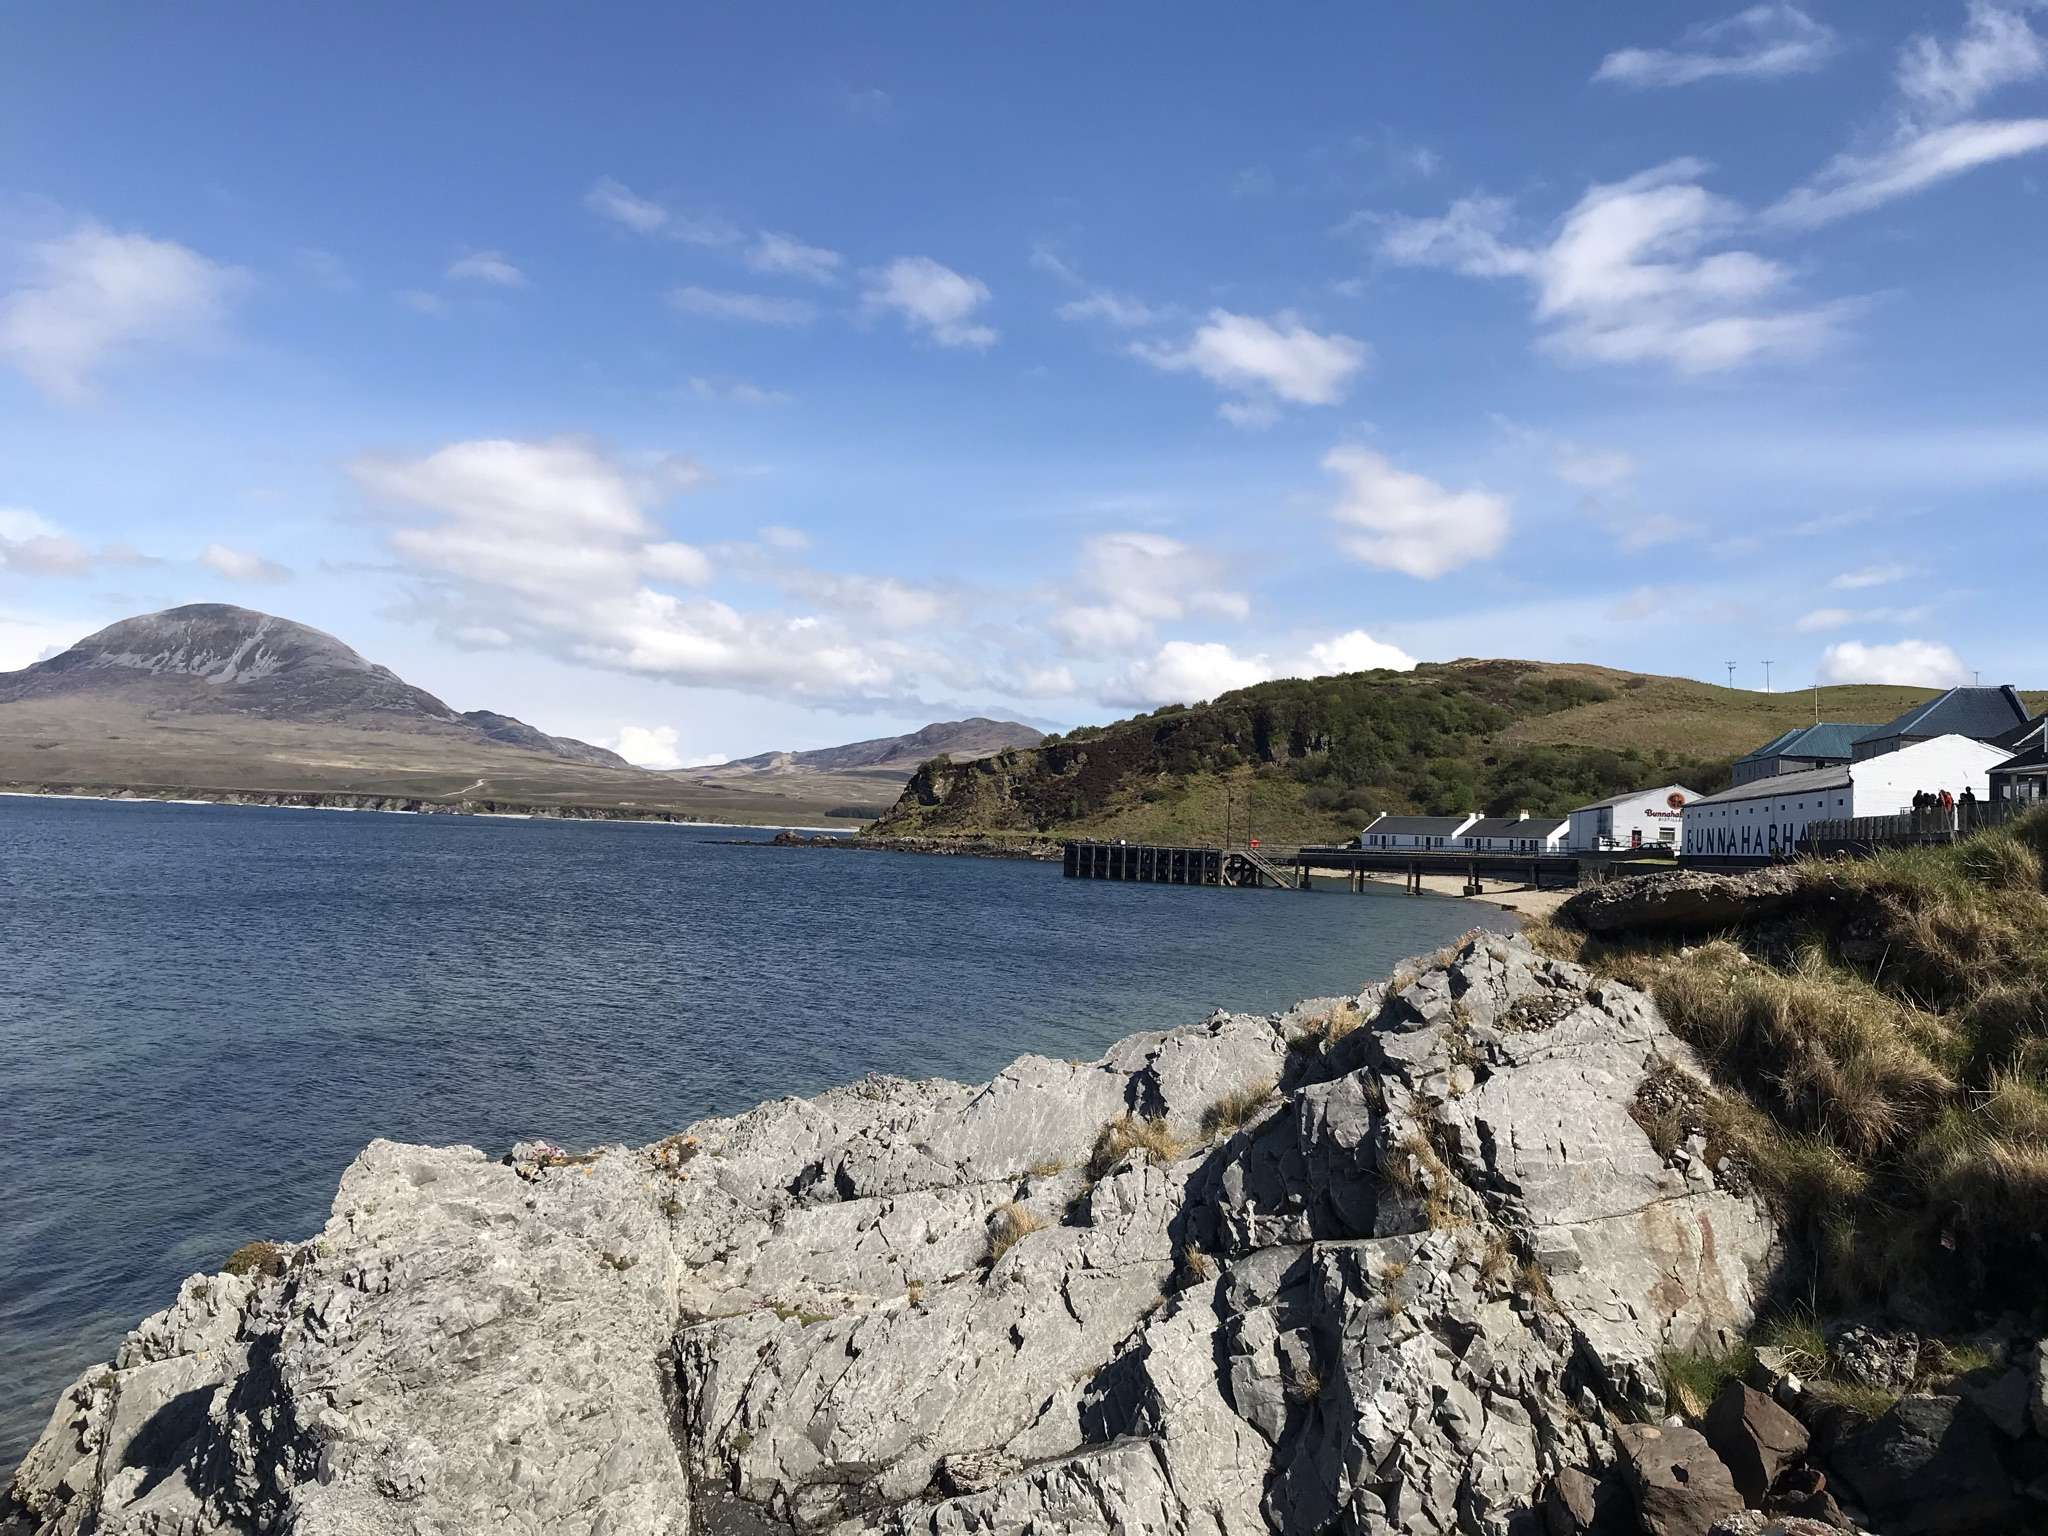 Bunnahabhain Distillery on Isle of Islay looking across to Isle of Jura